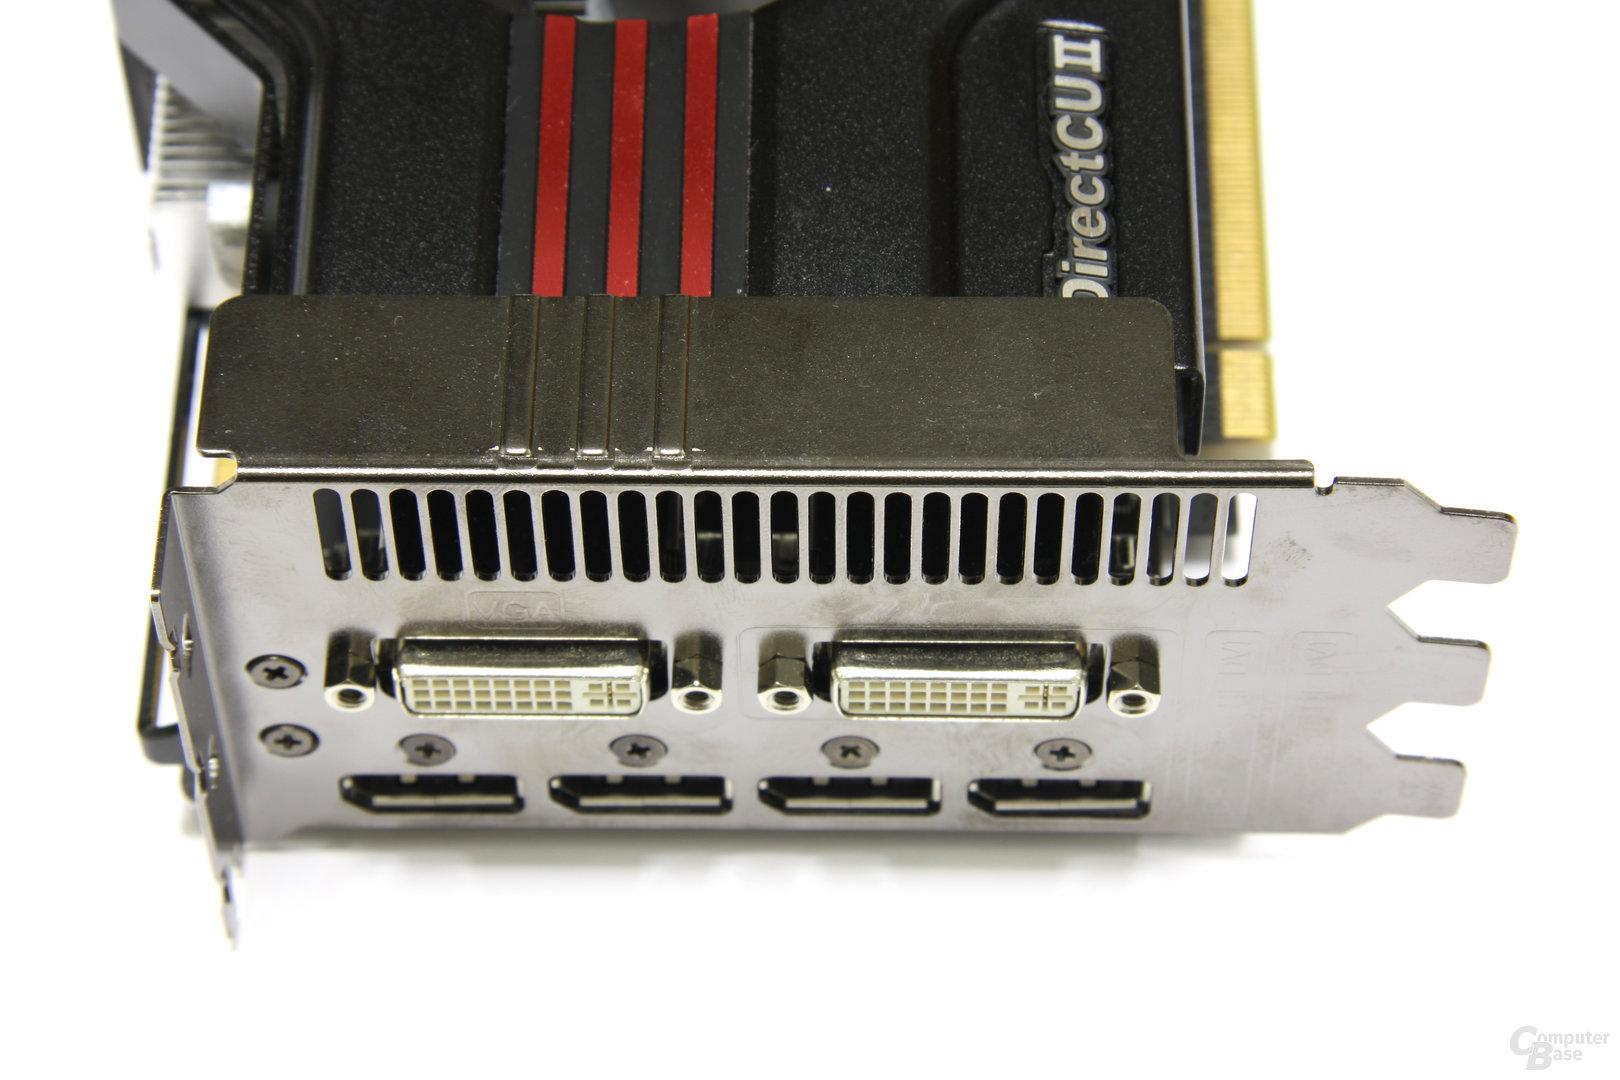 Radeon HD 6970 DirectCU II Anschlüsse